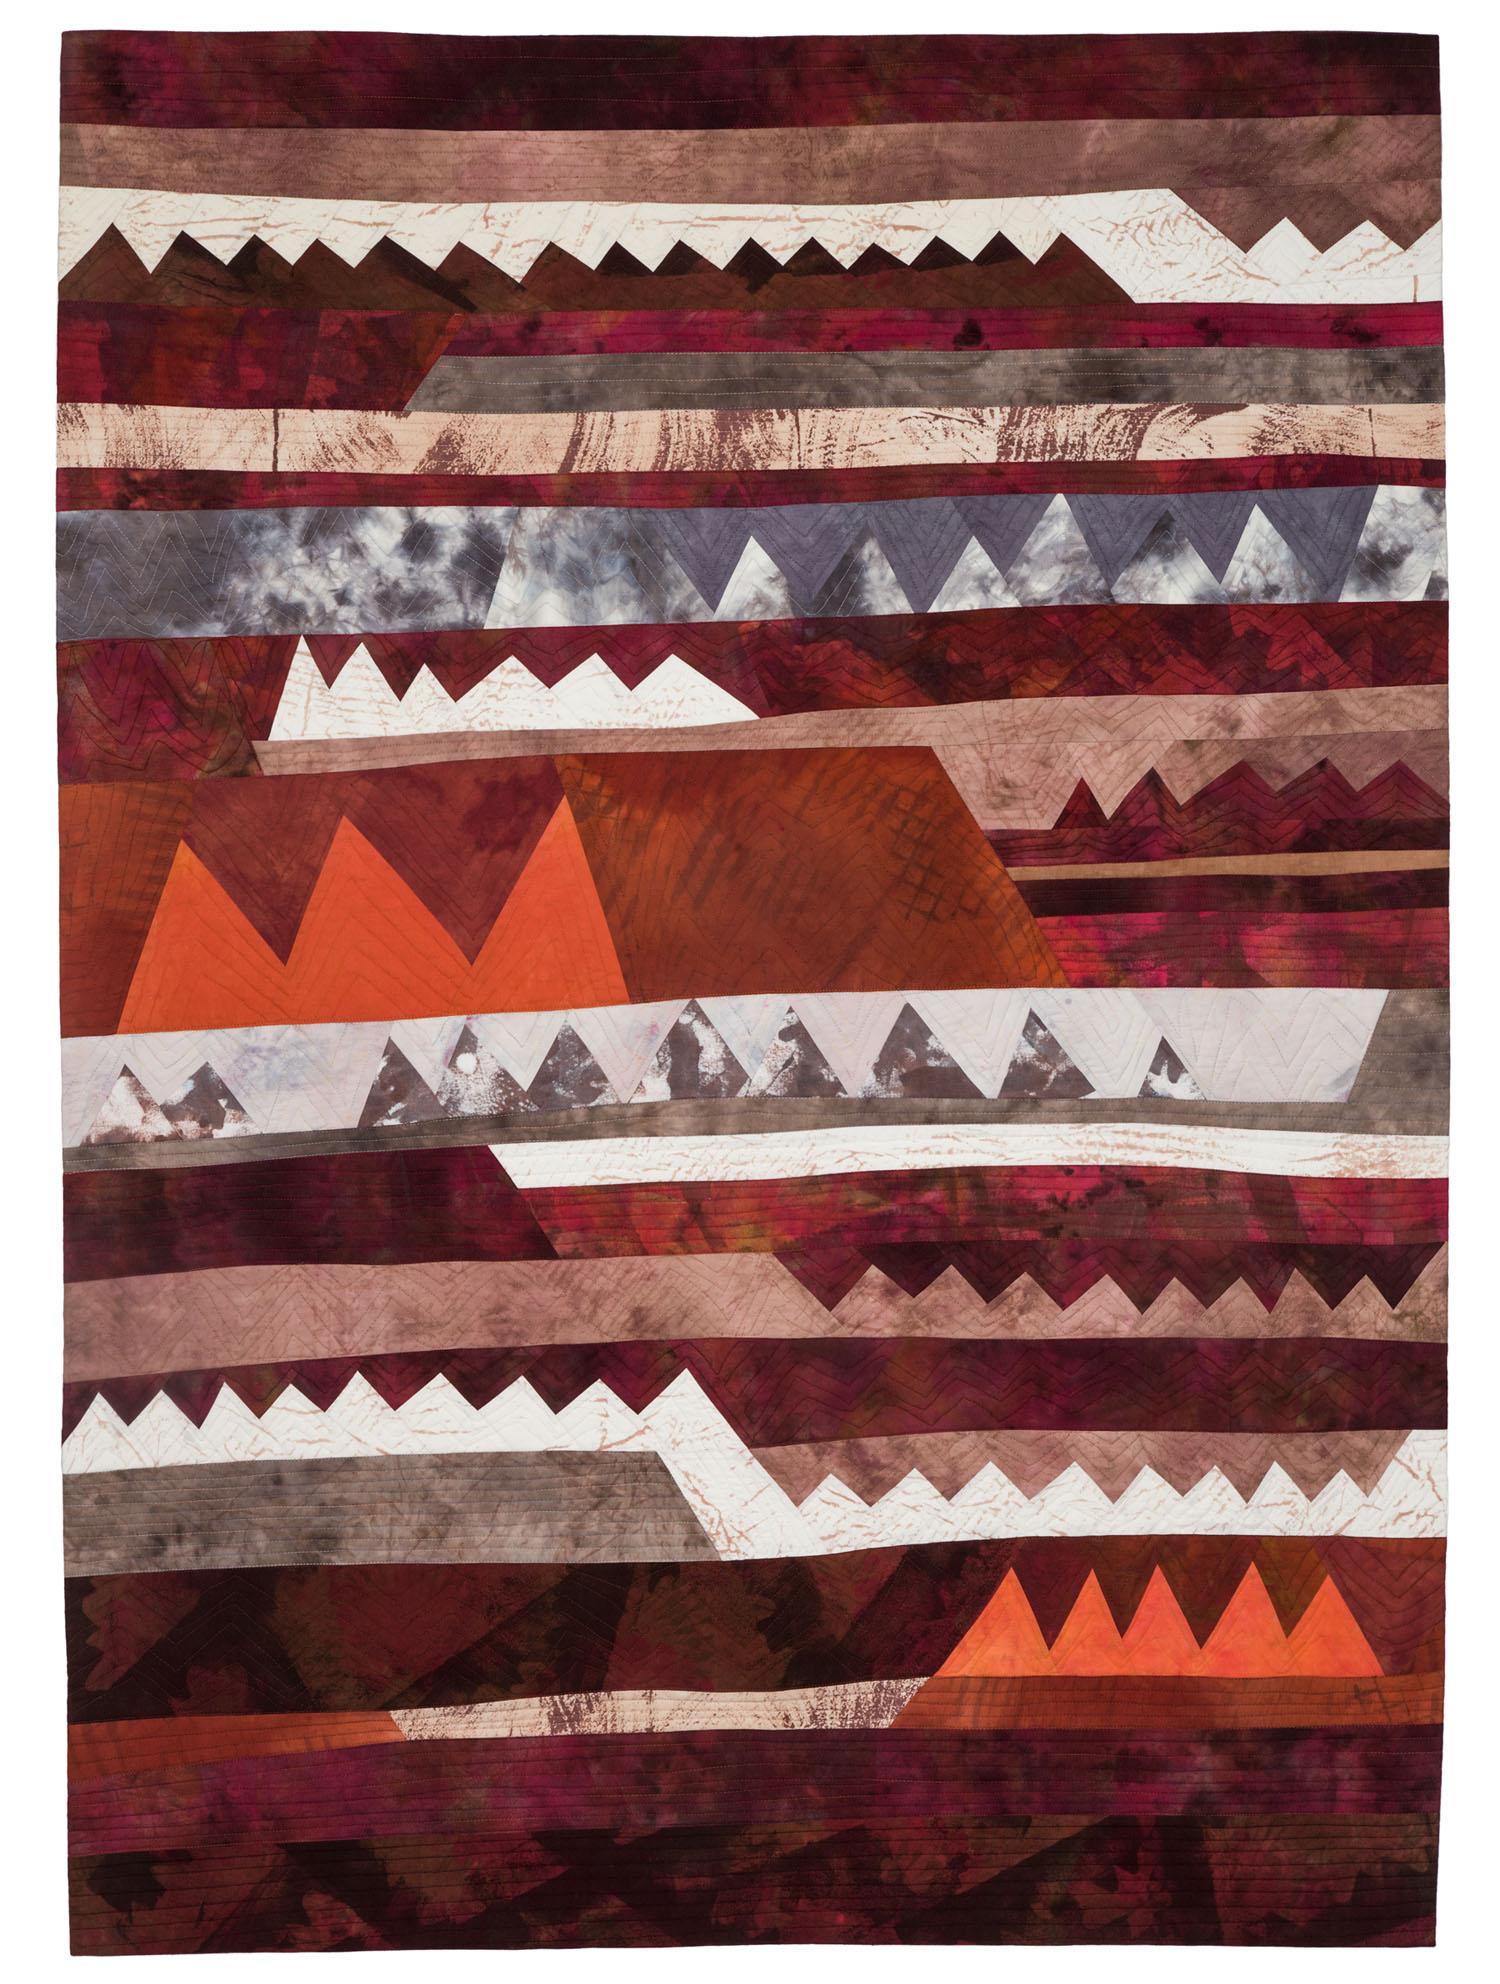 "Sawblades 11-Southwest Landscape, 41.5"" wide x 58"" tall, 2016"